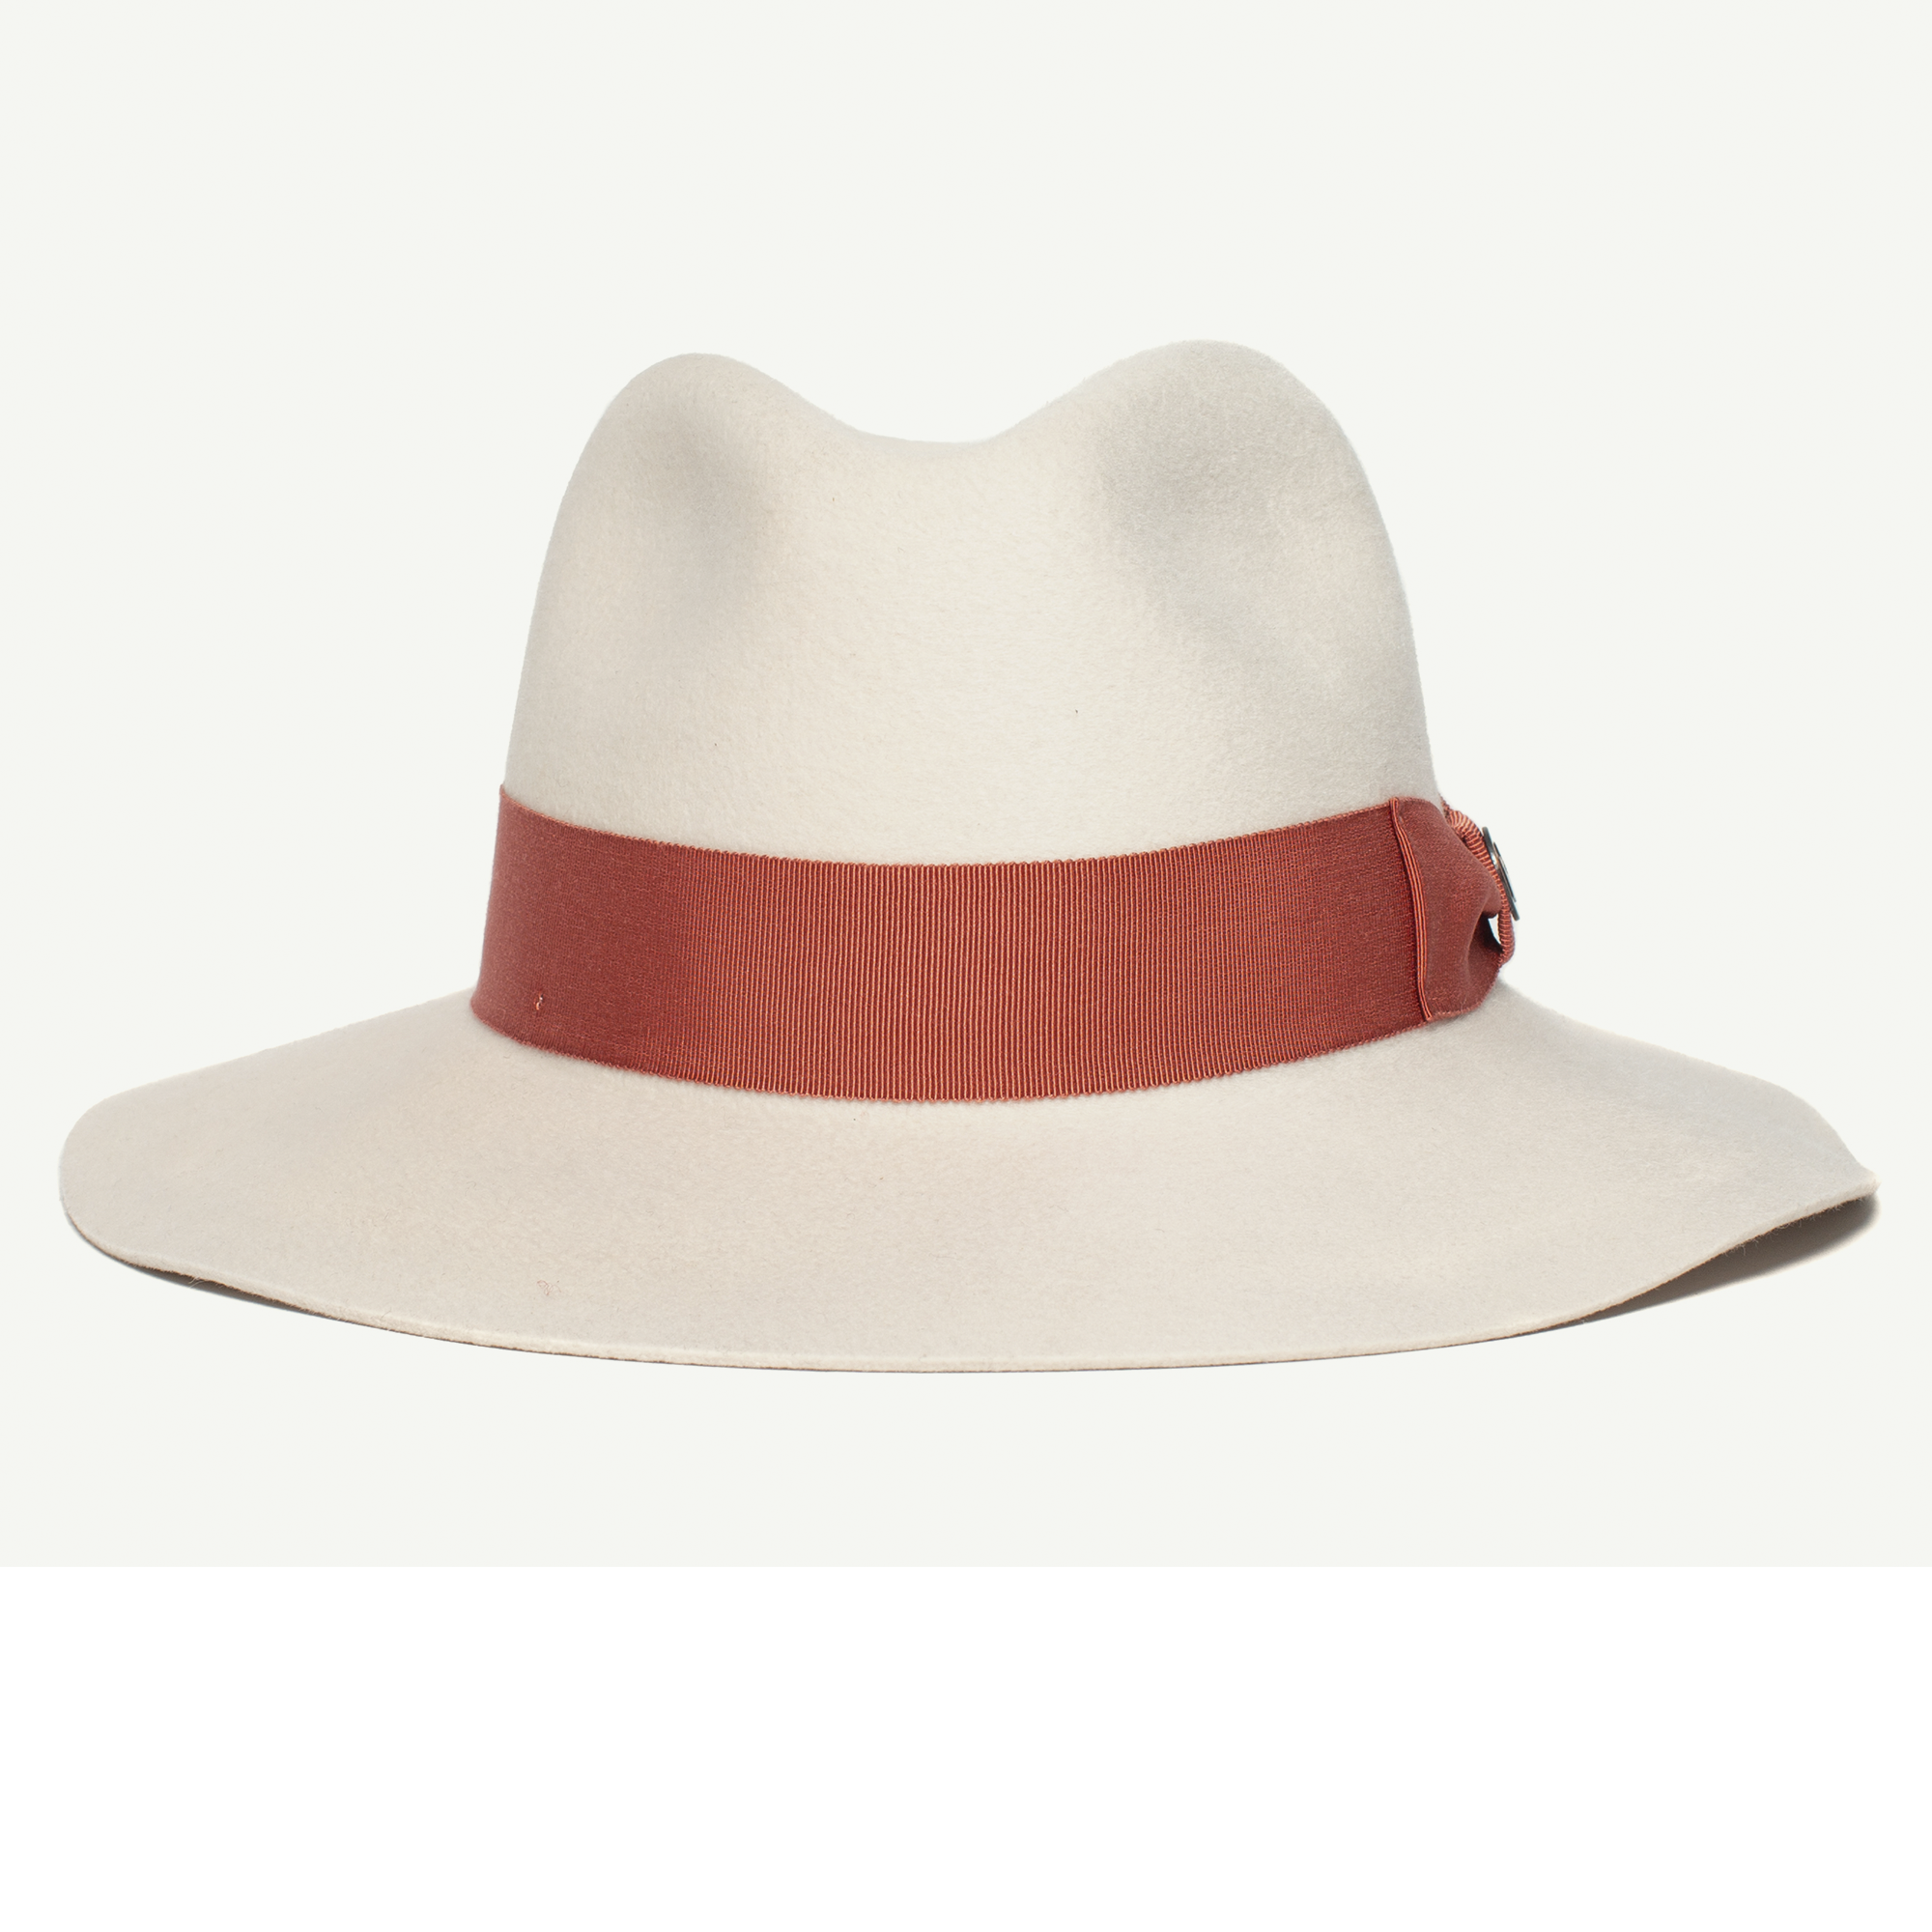 0a4de011b County Line in 2019 | Fashion Menswear | Hats, Fedora hat, Wide brim ...